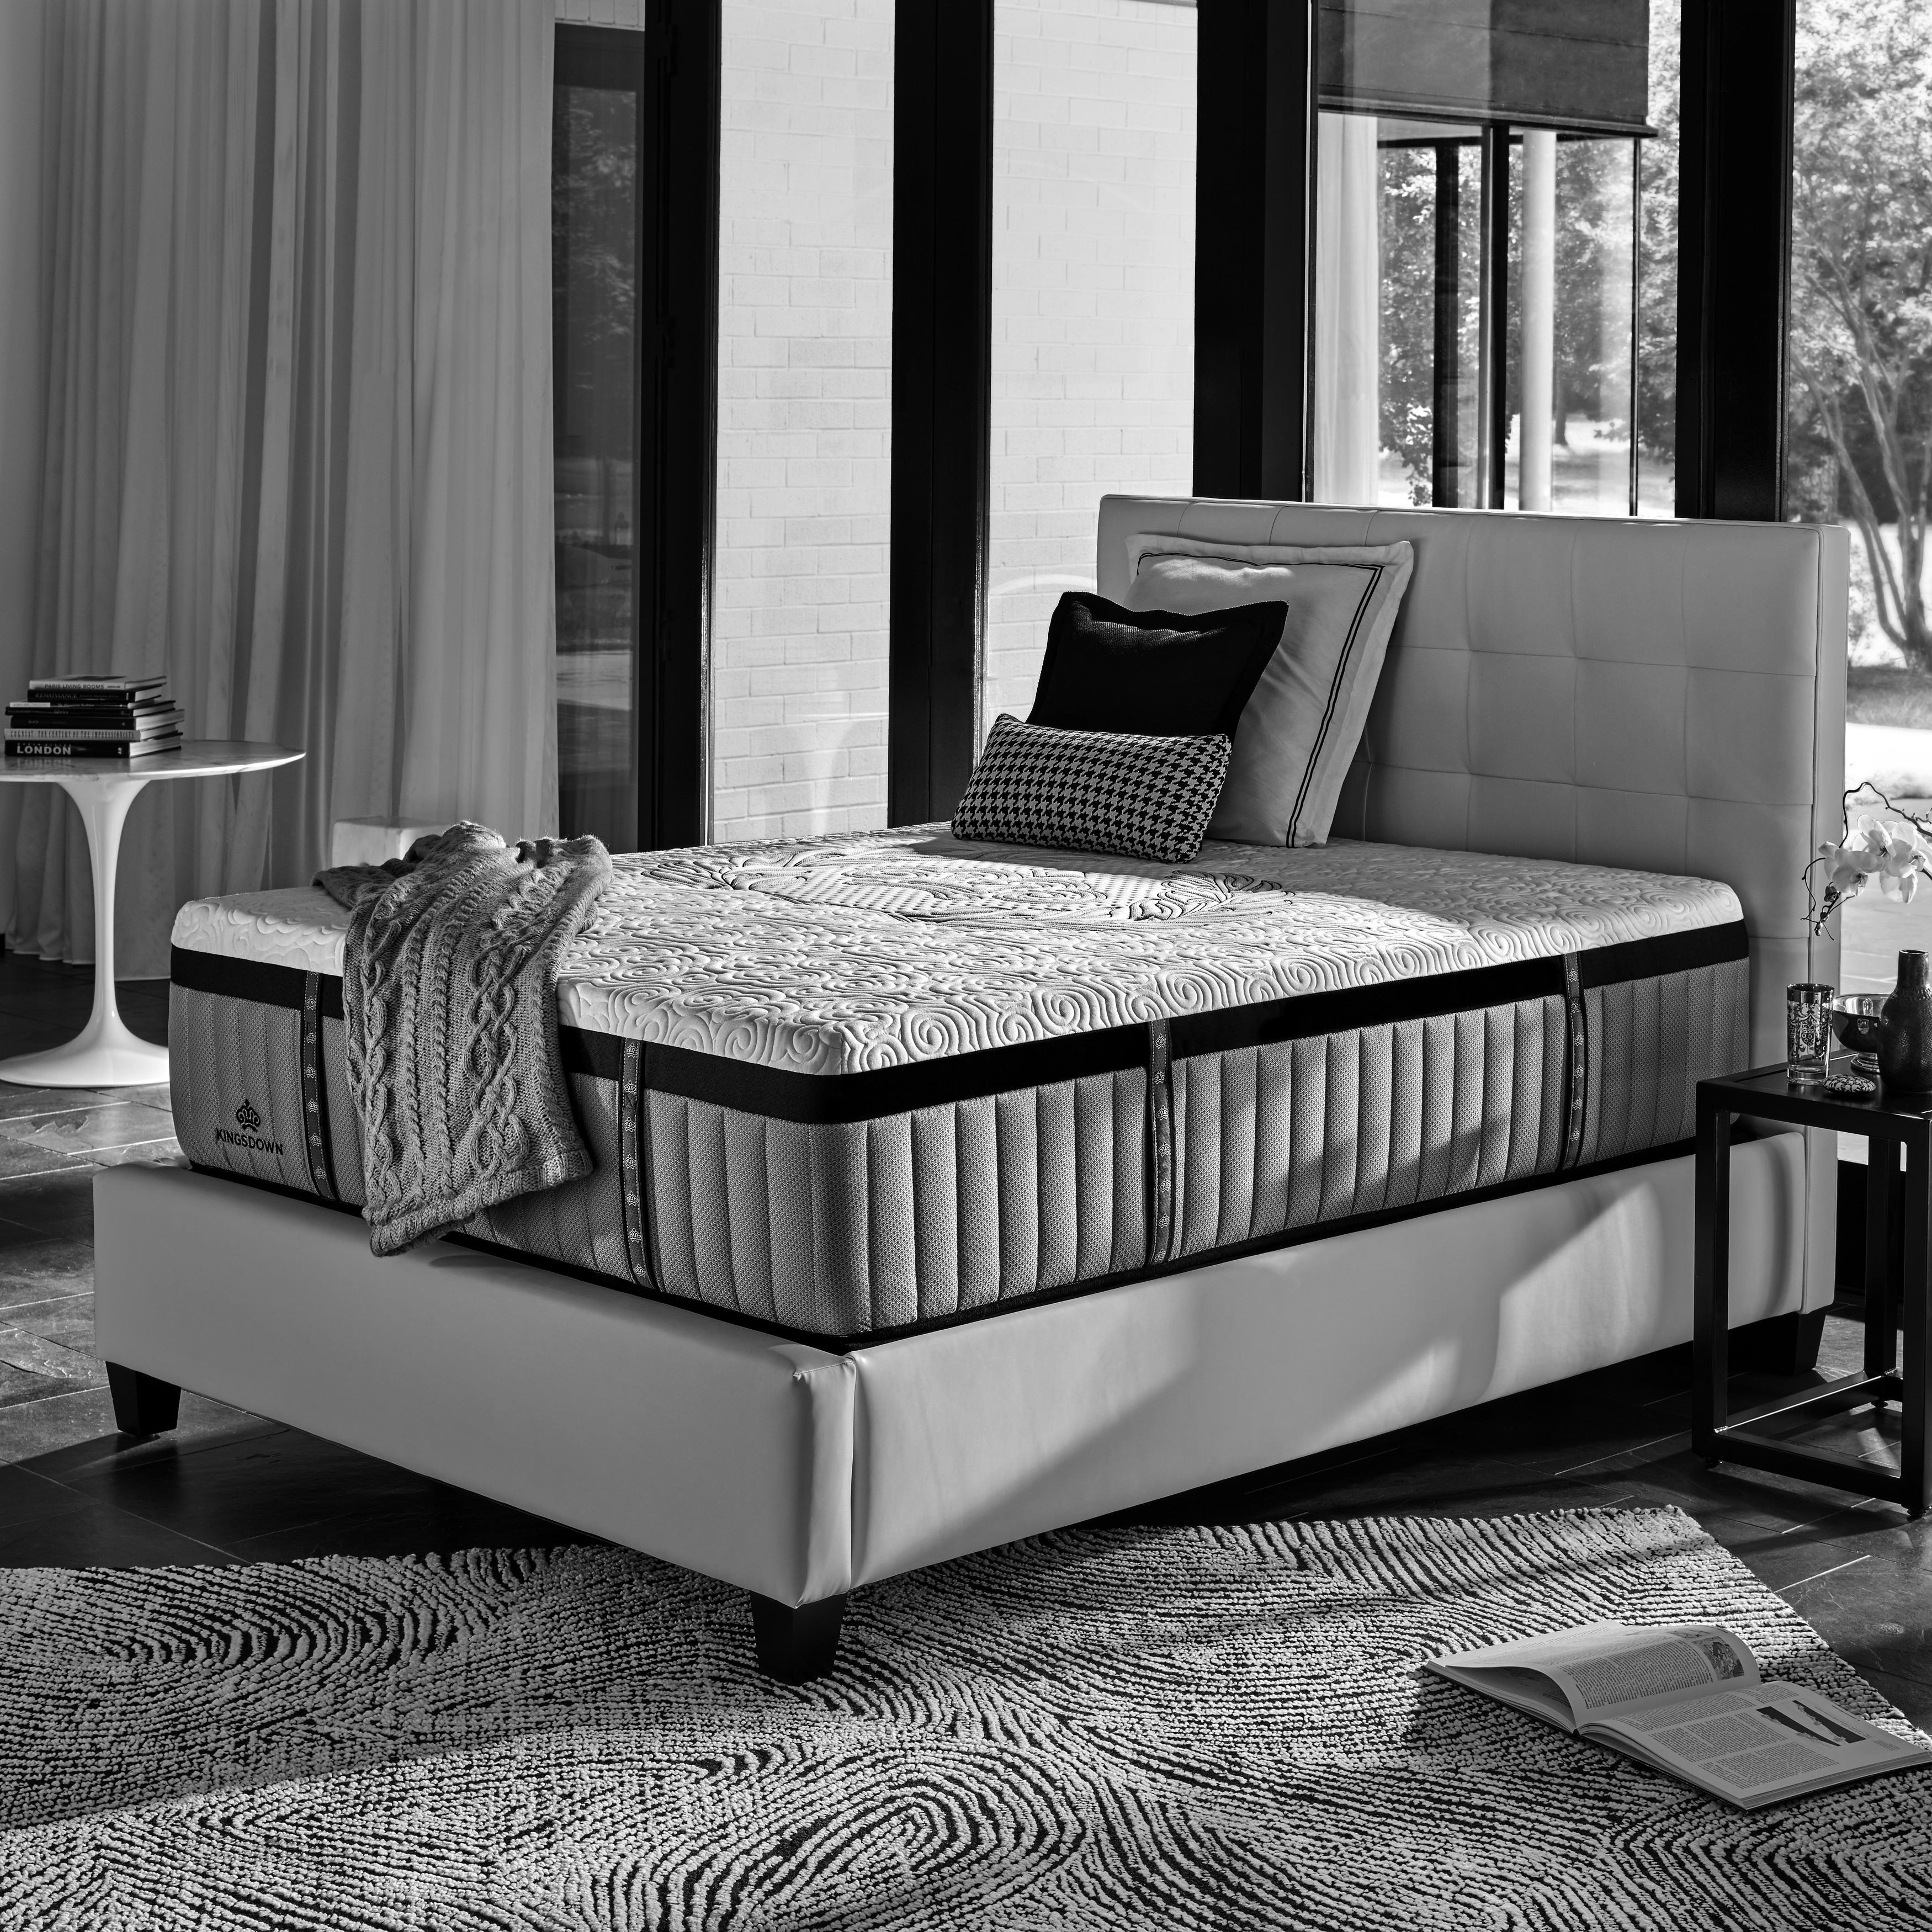 Kingsdown Crown Imperial Empire 13 Inch Luxury Cushion Firm Hybrid Mattress Set